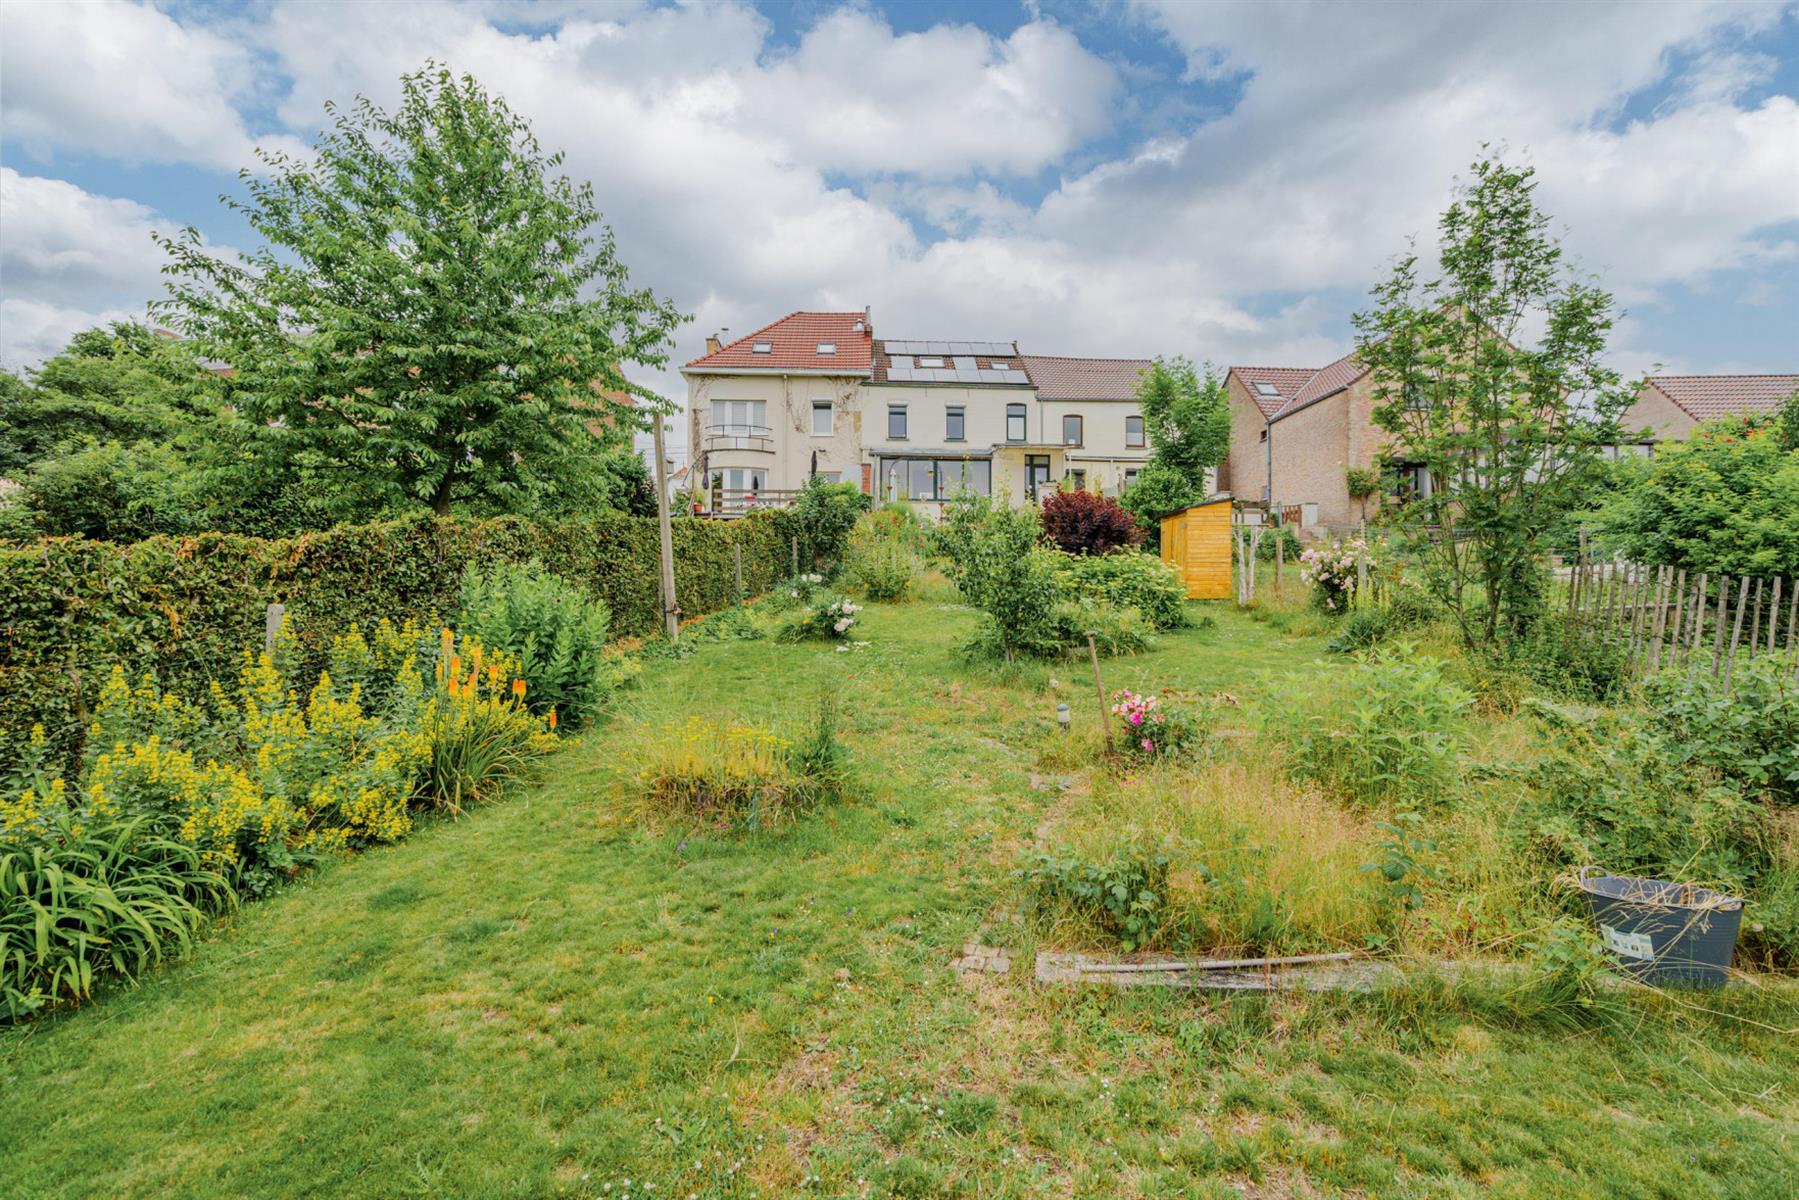 Maison - Bousval - #4395358-23